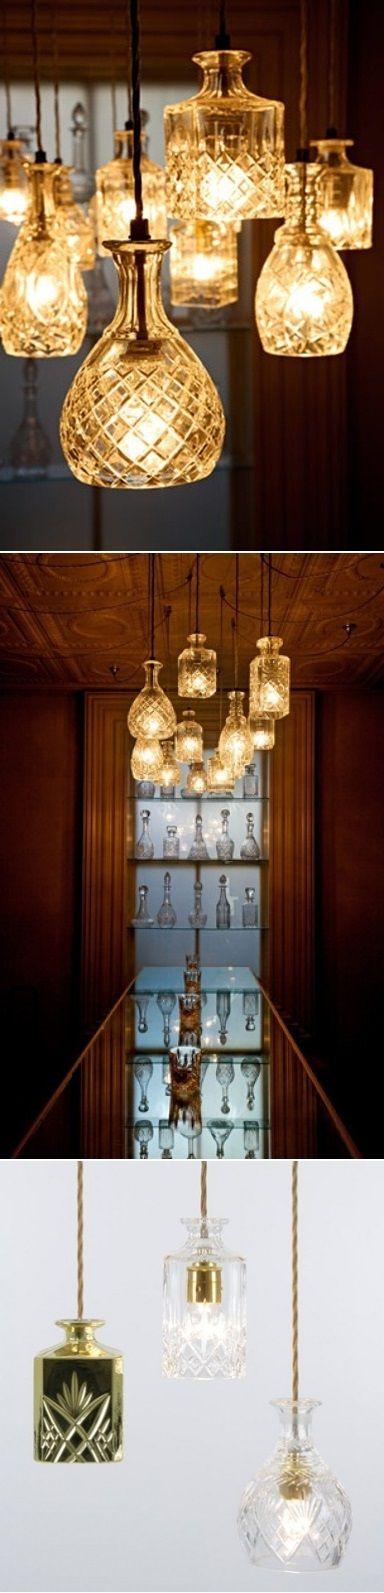 DIY Crystal Decanters As Pendant Lights